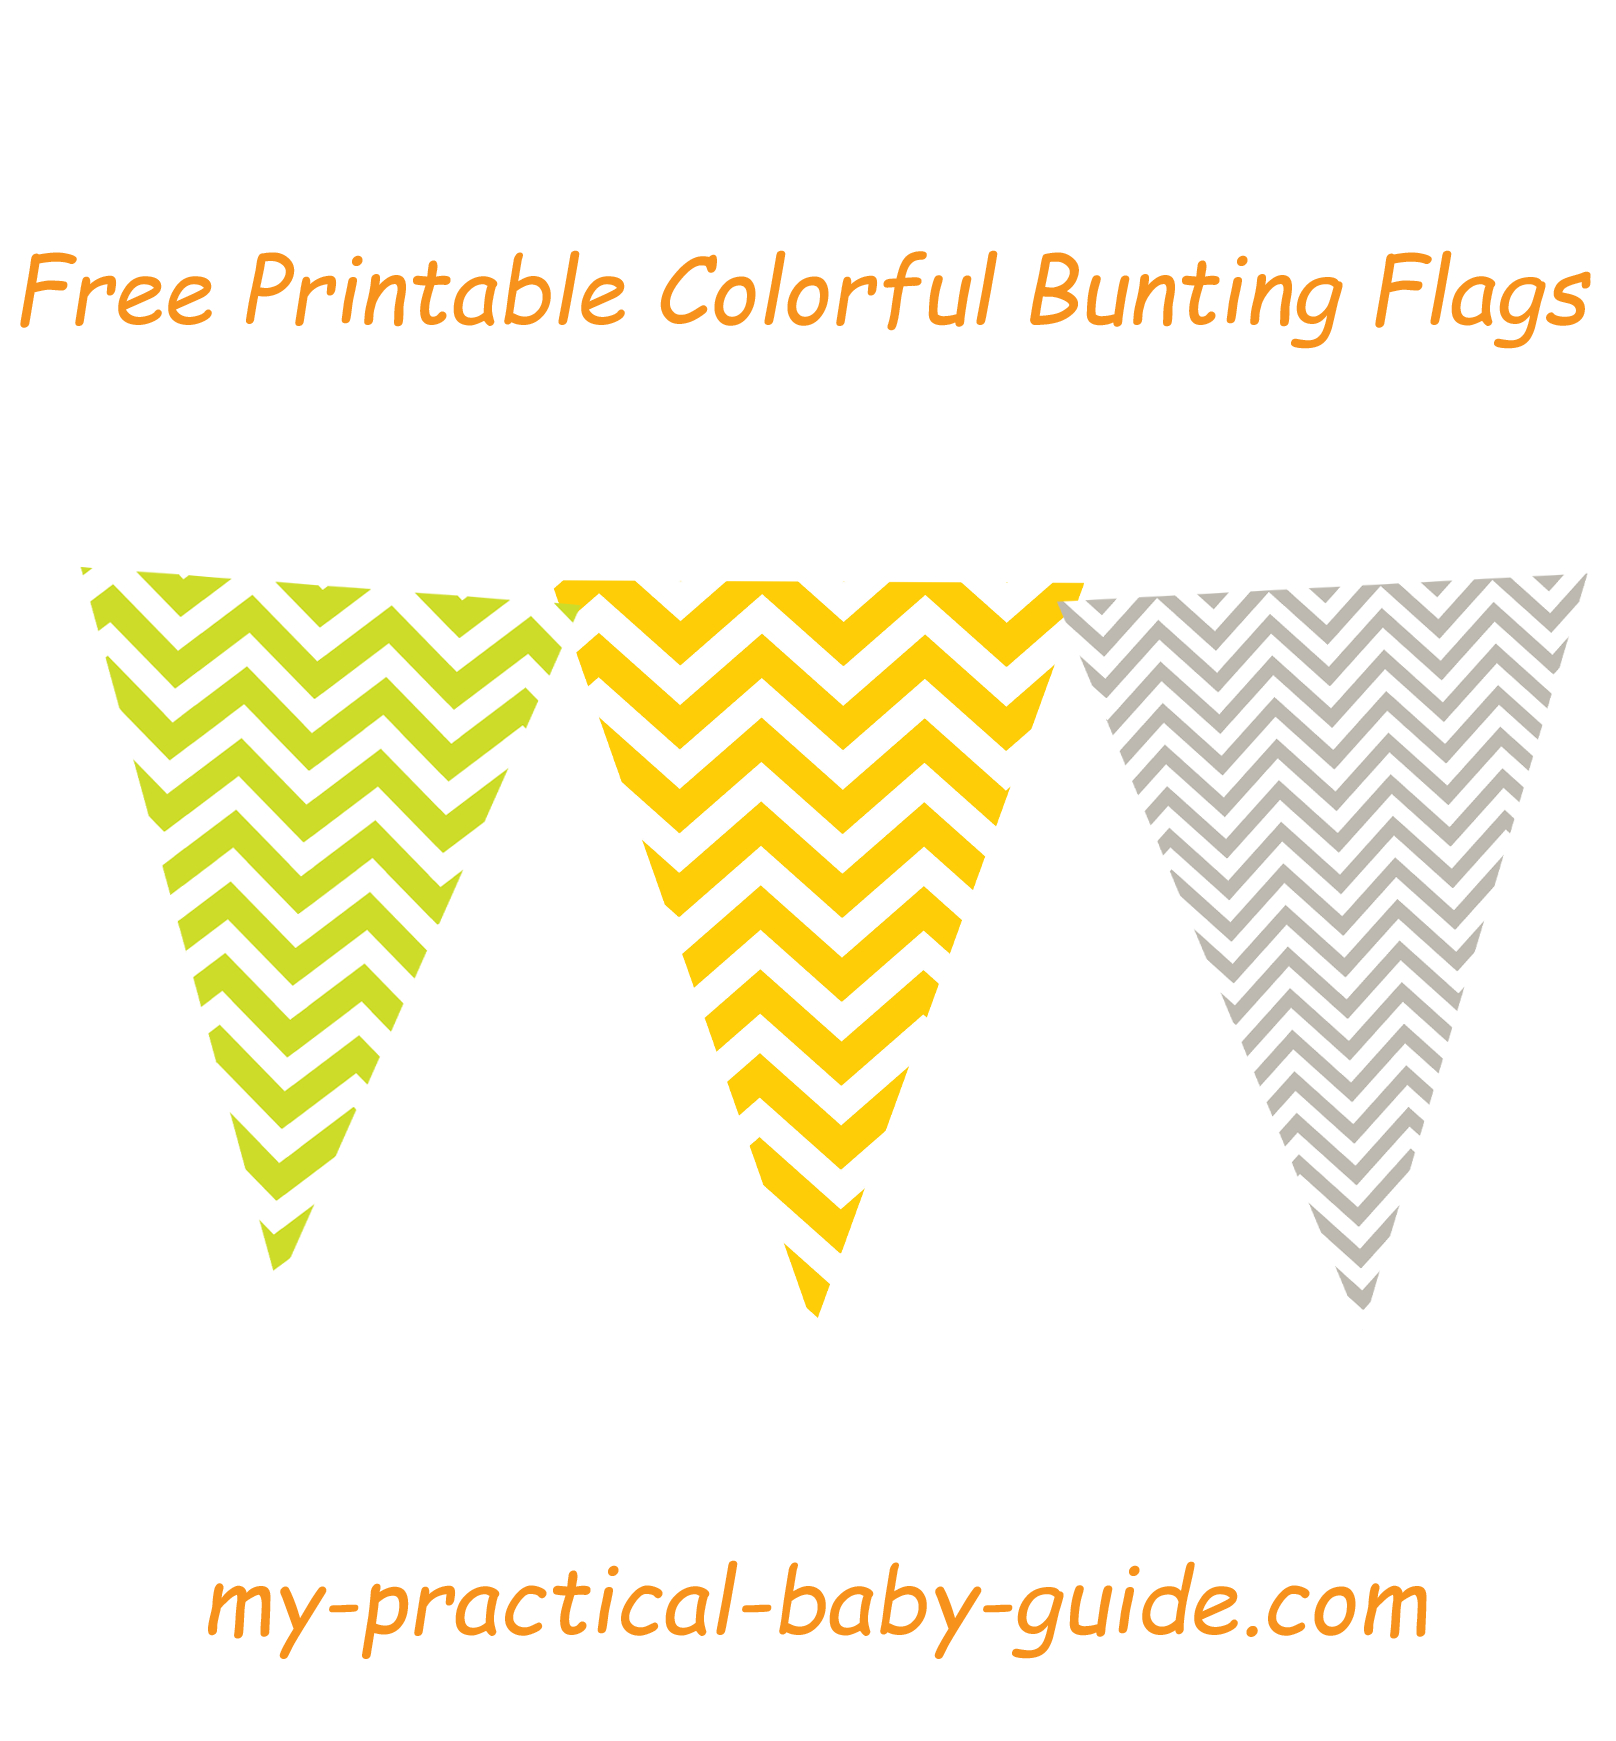 Woodland Baby Shower Theme Ideas - My Practical Baby Shower Guide - Baby Shower Bunting Free Printable